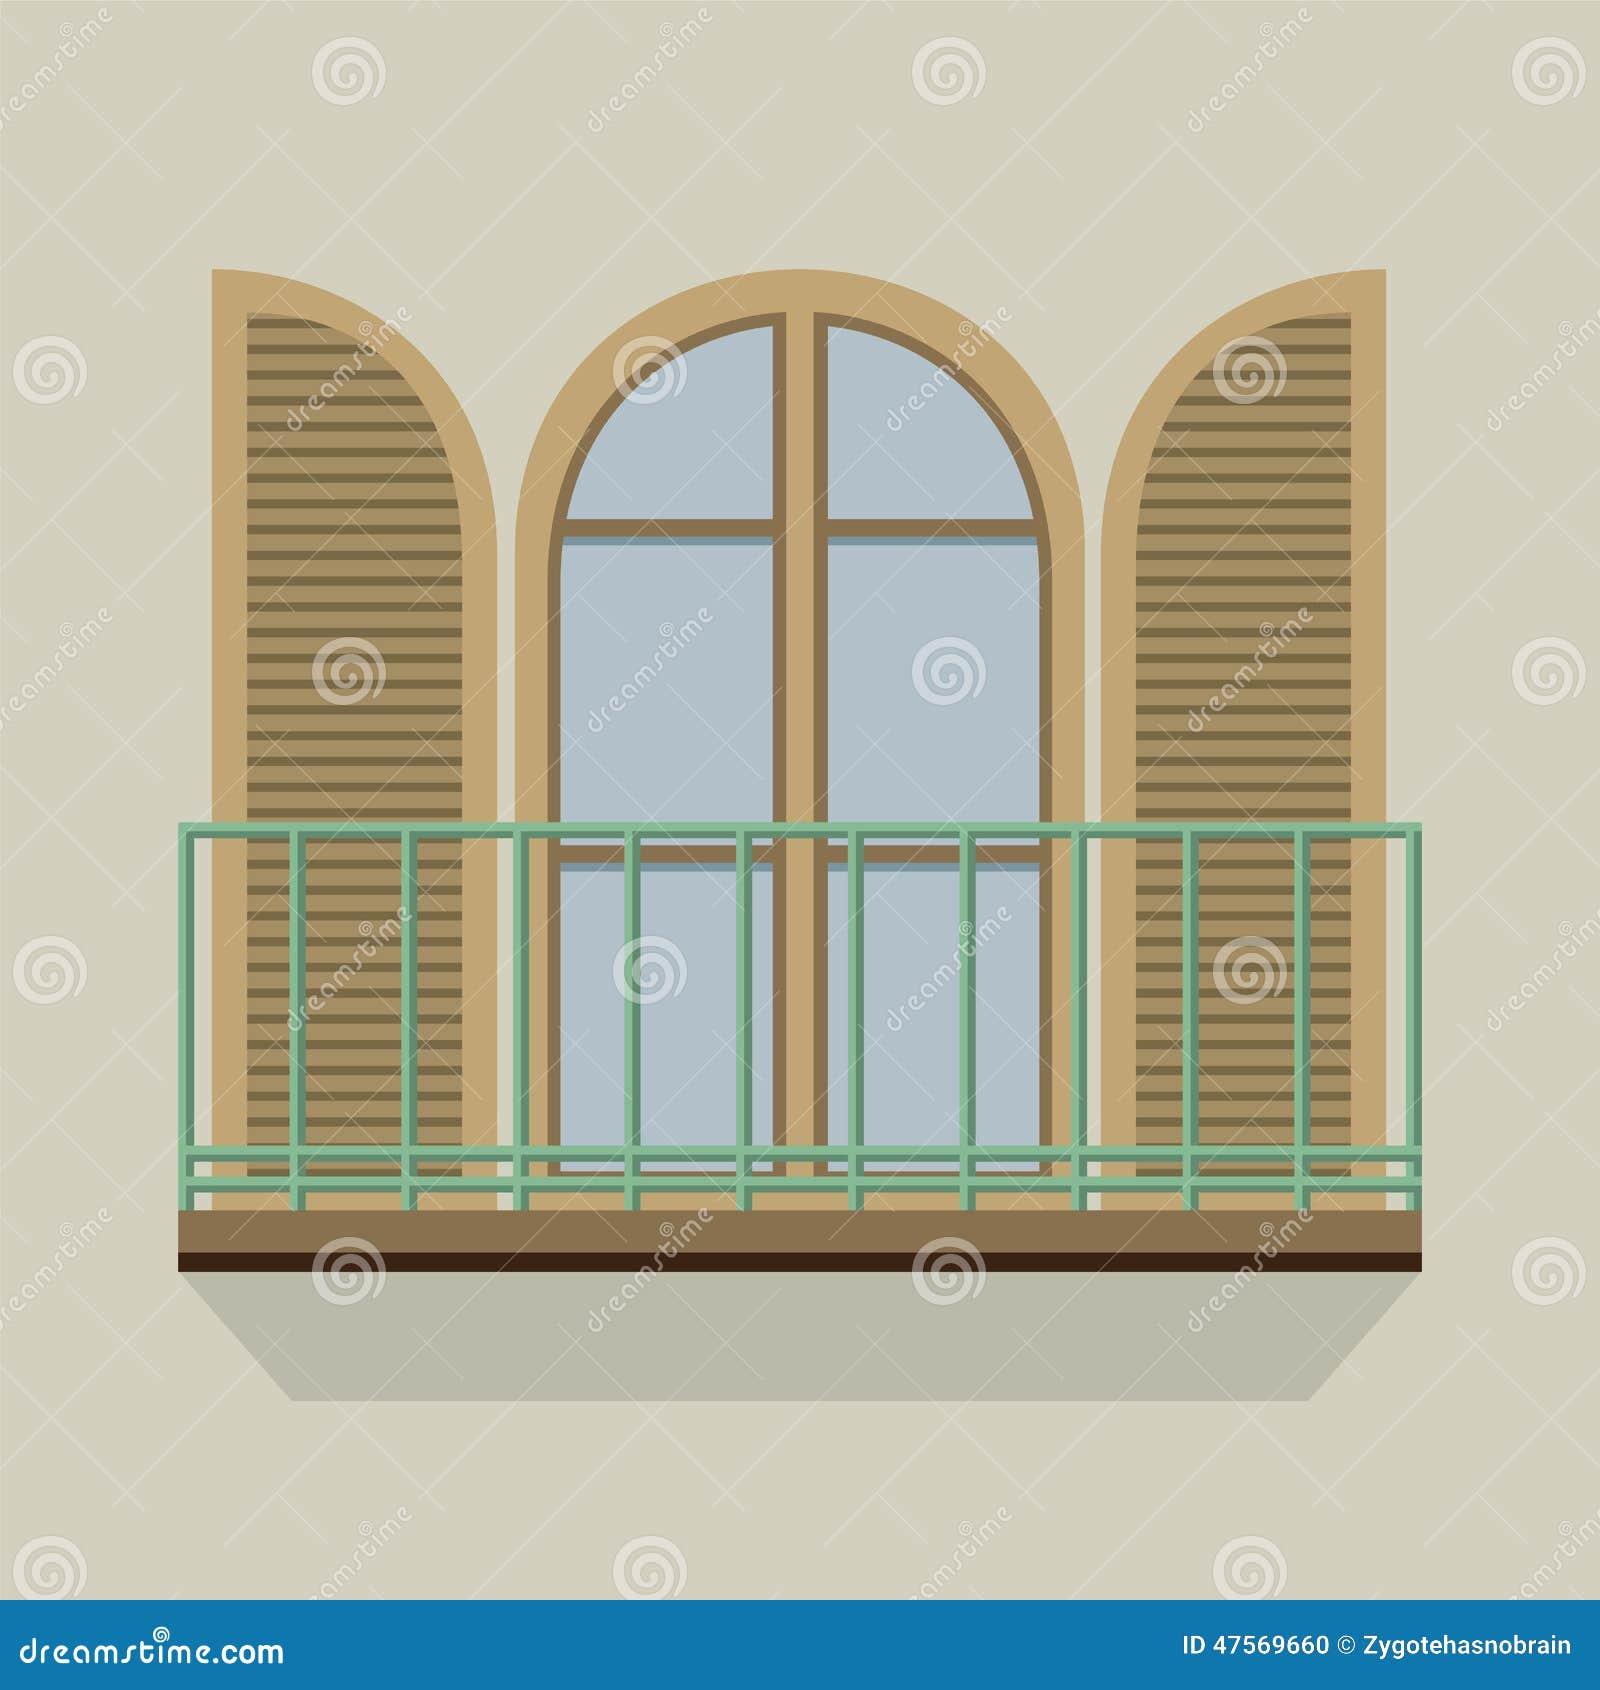 Open door with balcony vintage style stock vector image for Balcony vector